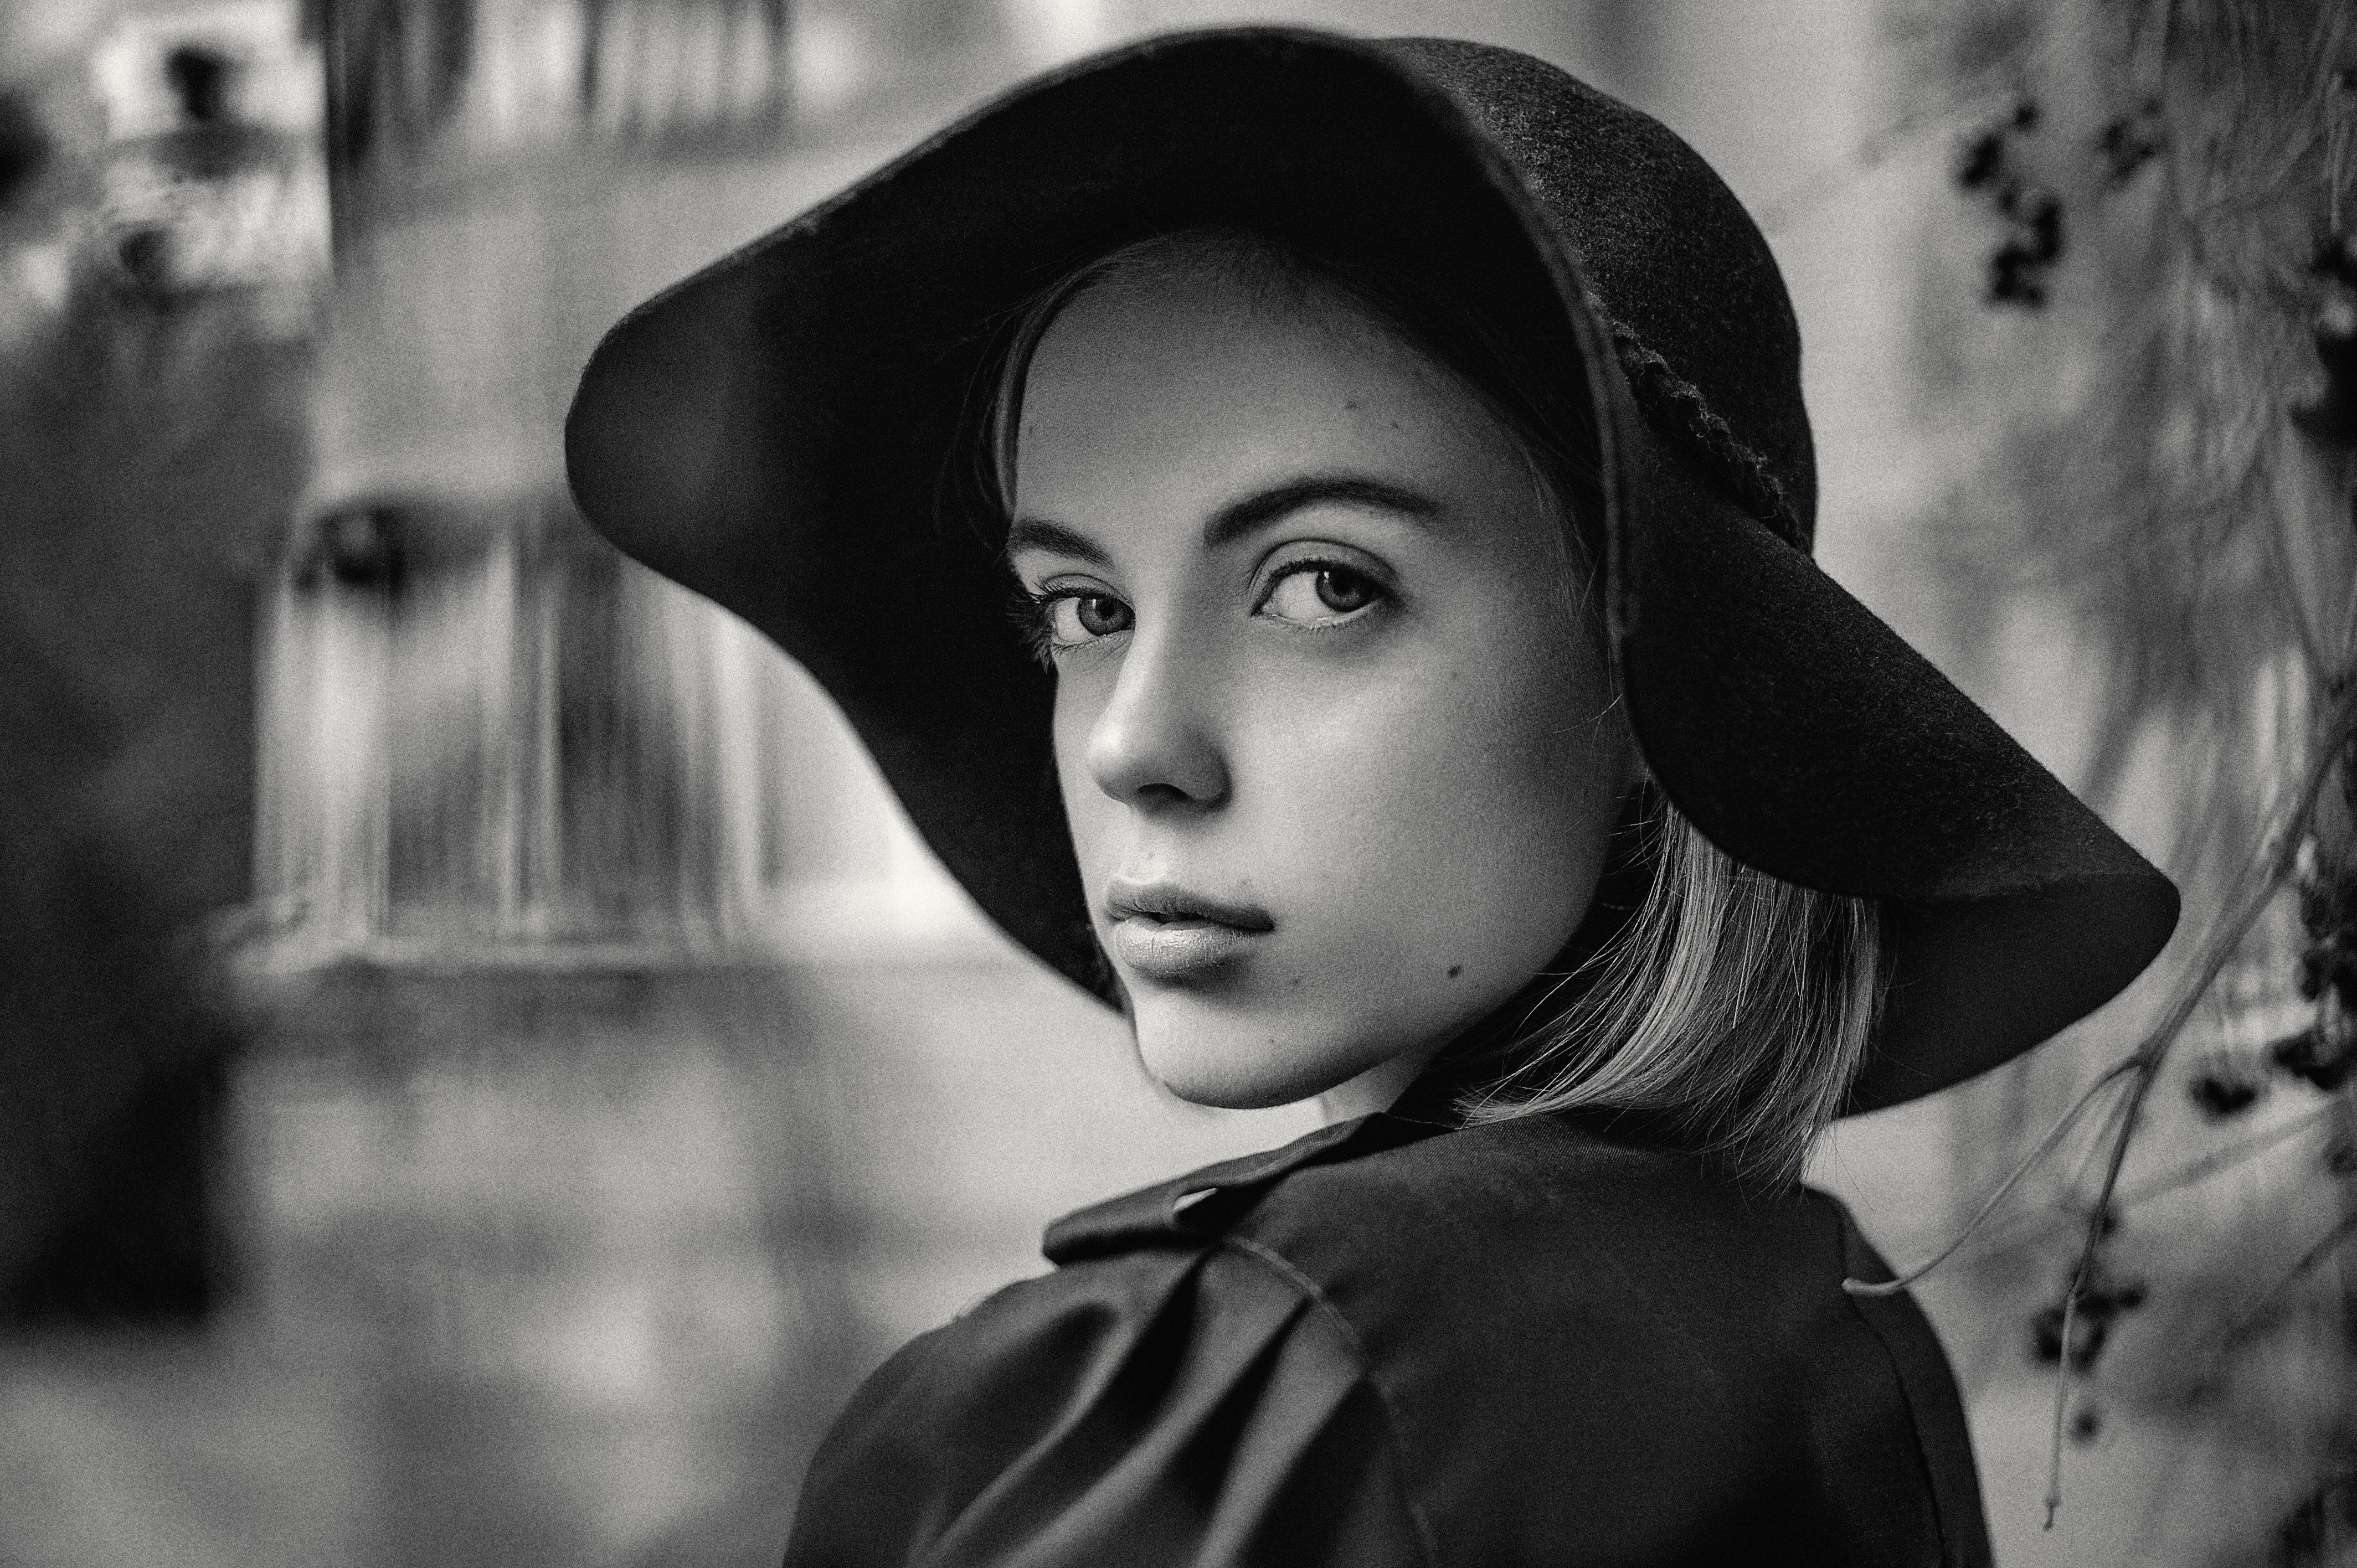 #franpolonsky #phfranpolonsky #franpolonskyphotographer #photo #face #monochrome #bw #blackandwhite #portfolio # portrait #girl #woman #mood #streetphoto #streetstyle #bestphoto #ukraine #tfp #hair #lips #портрет, Фран Полонский